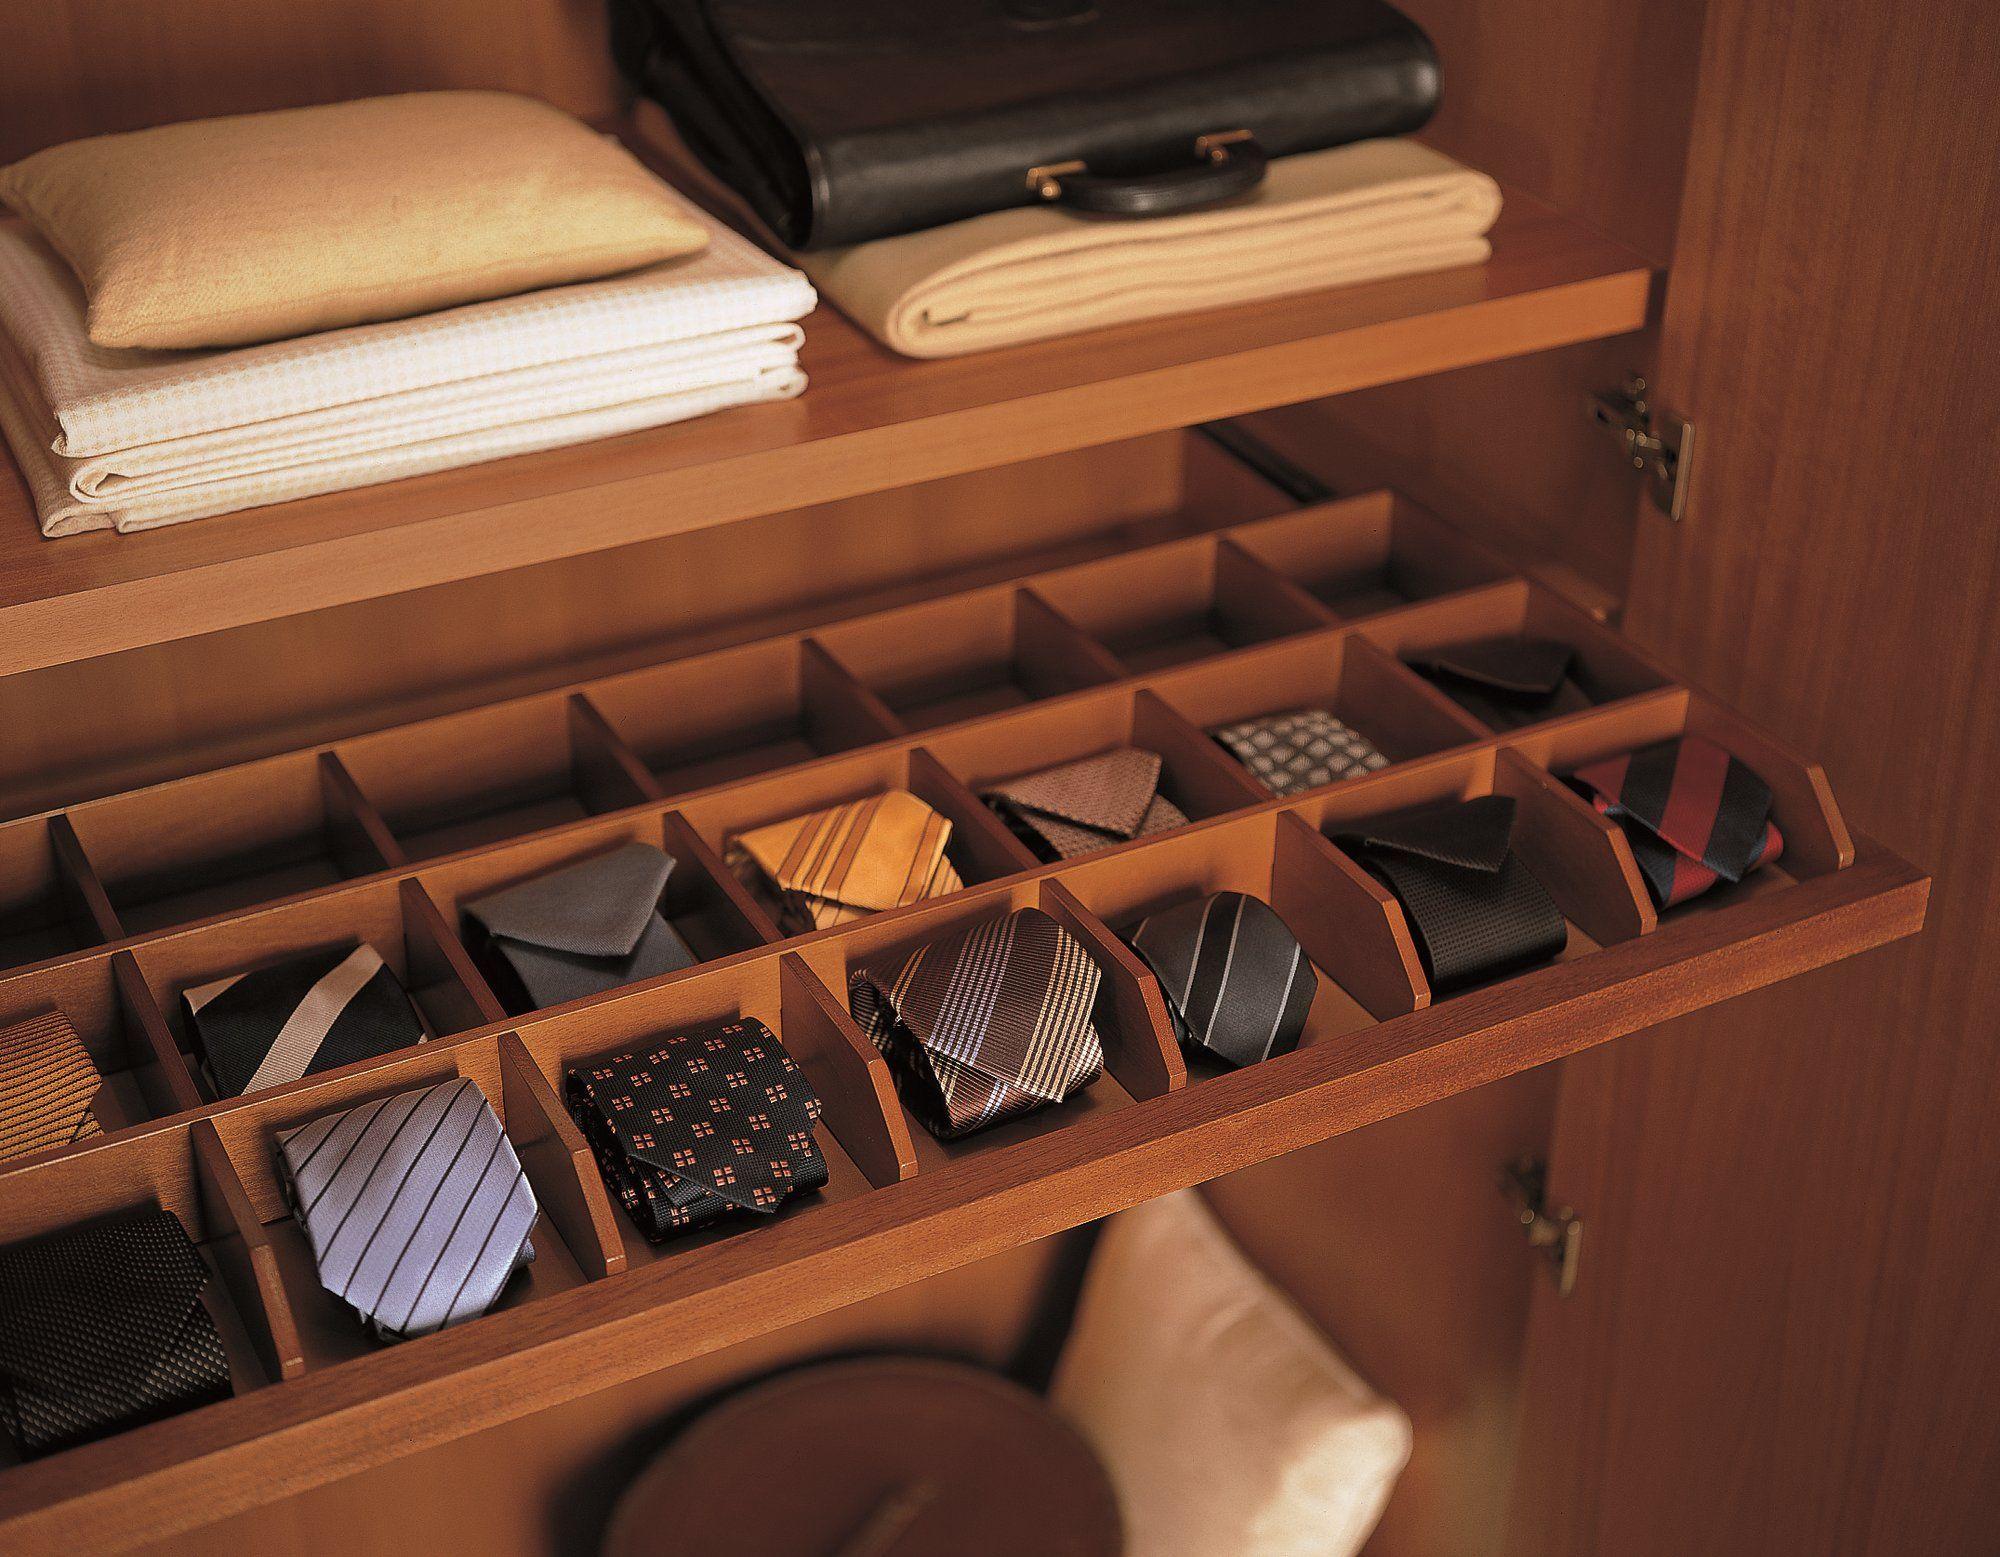 Unico armadio ad angolo by dall agnese design komma - Dall agnese mobili classici ...